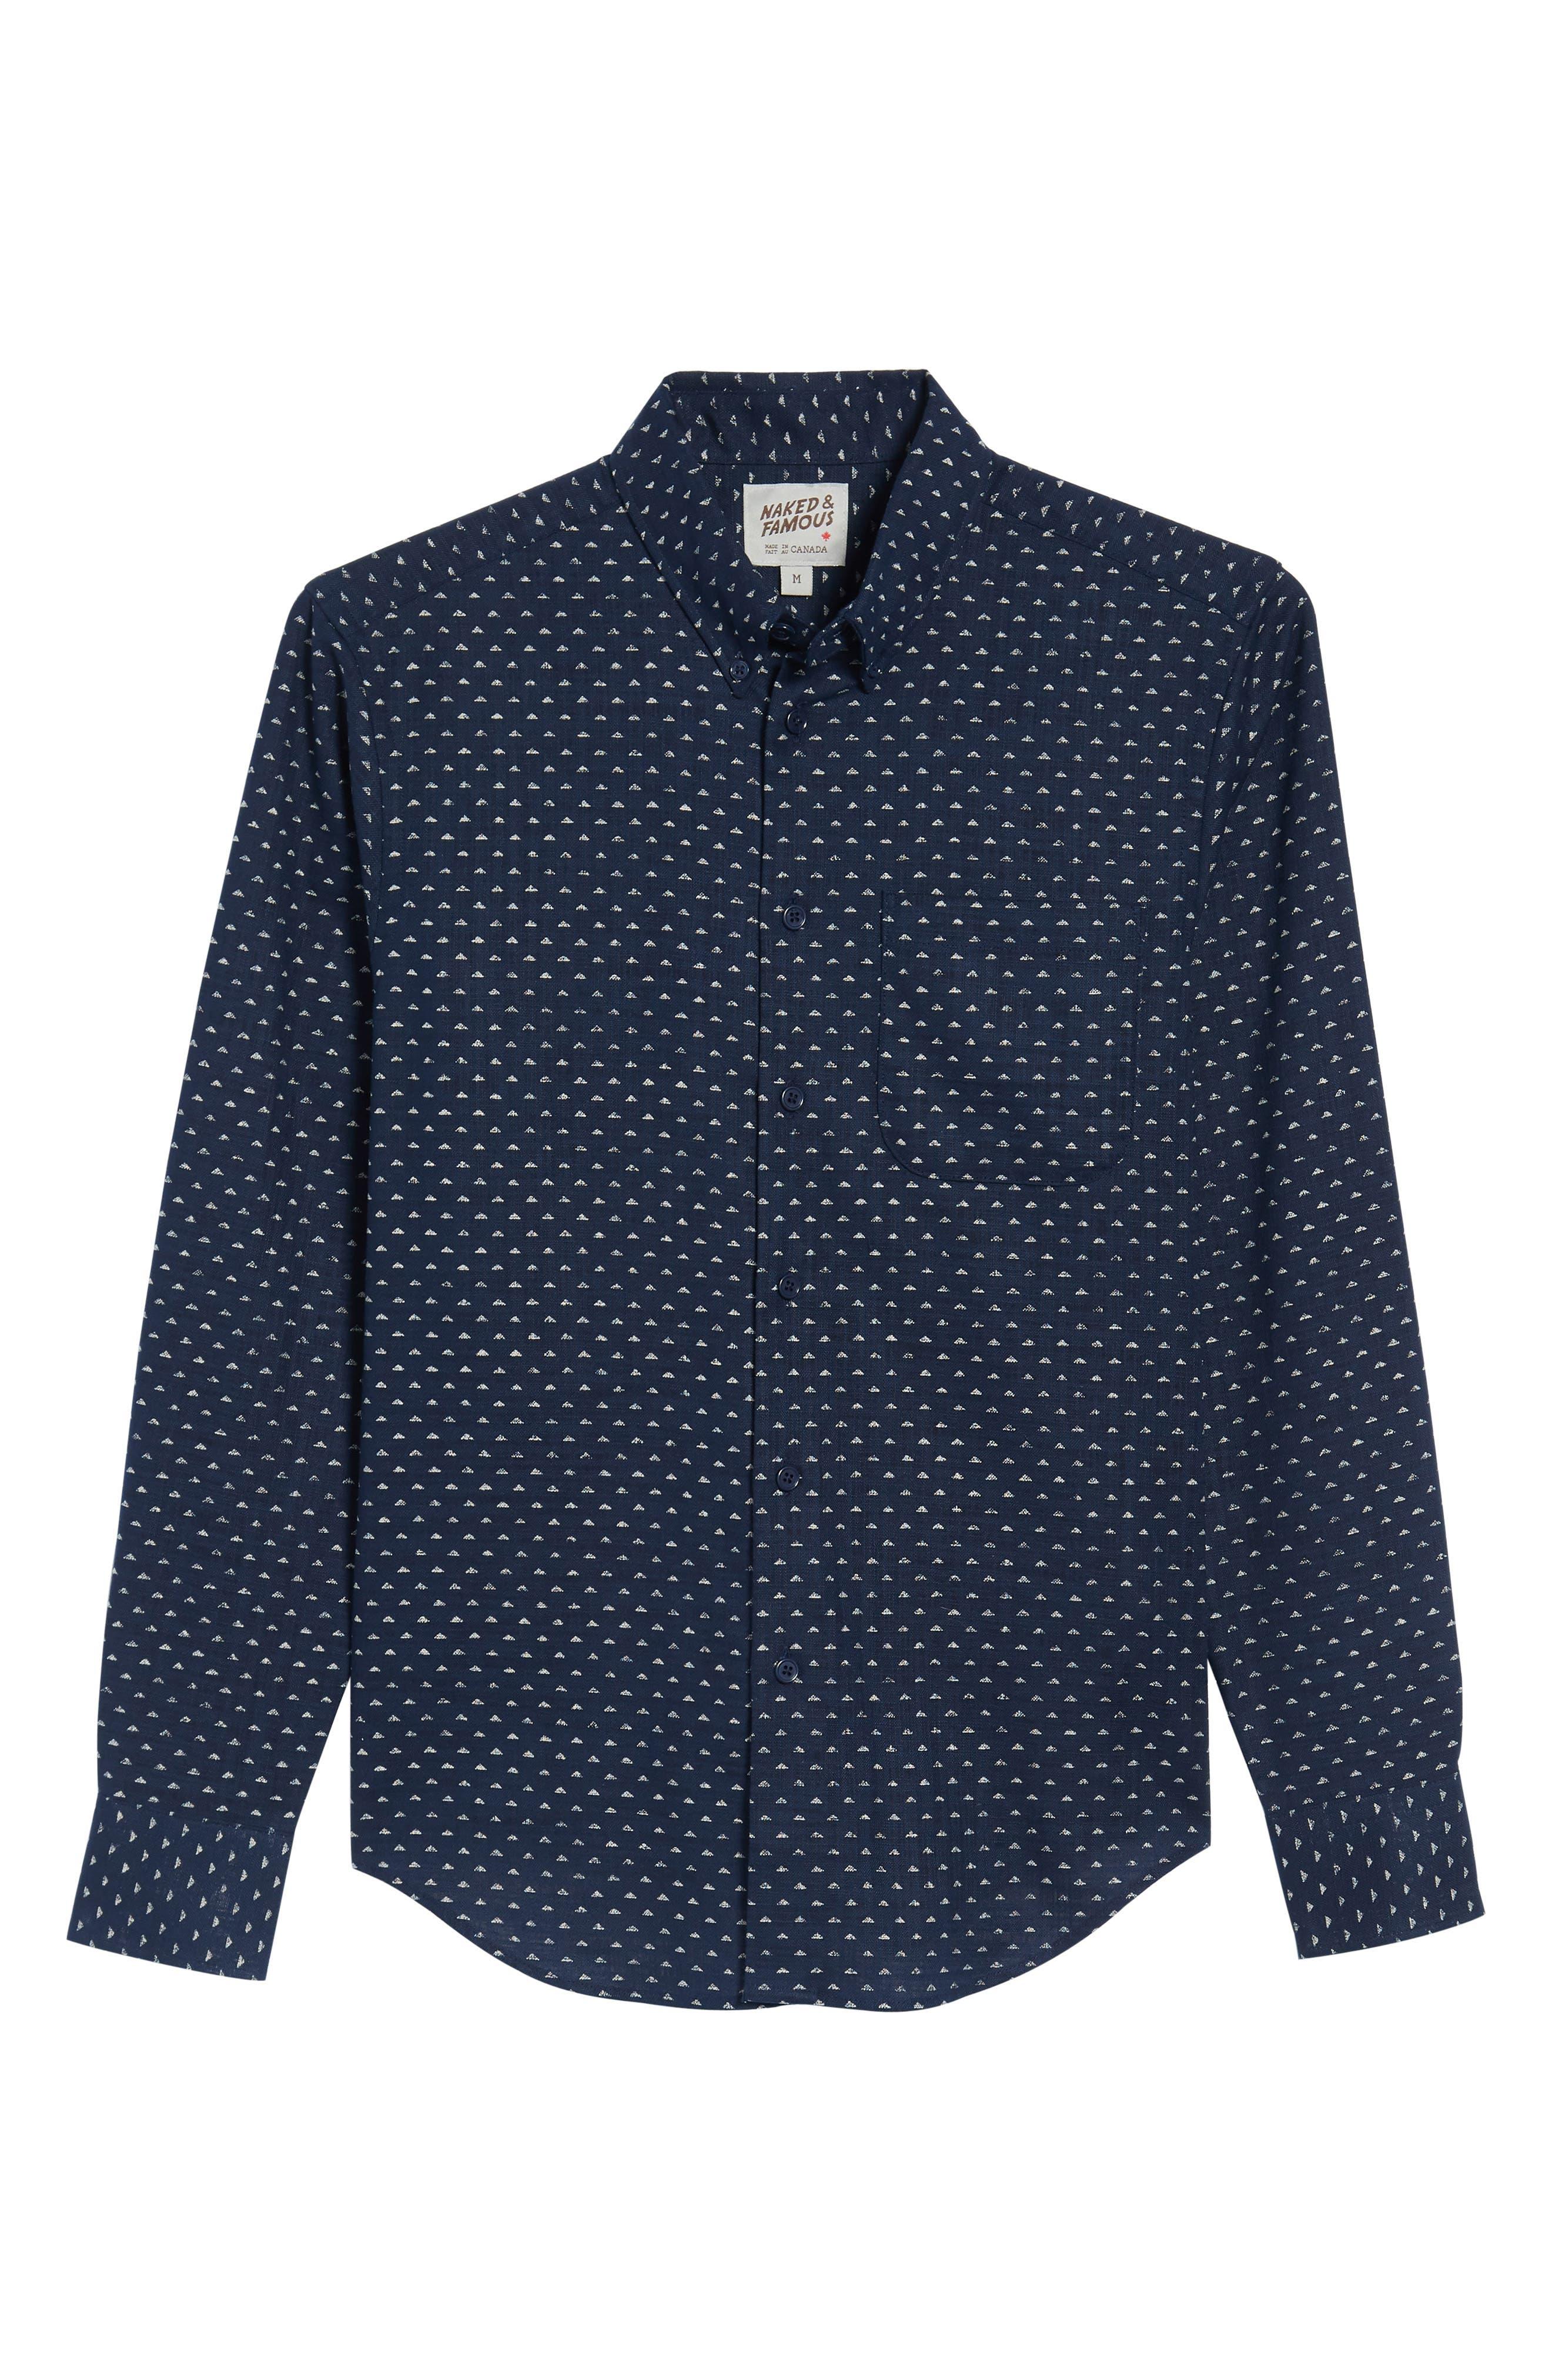 Kimono Print Shirt,                             Alternate thumbnail 6, color,                             Indigo